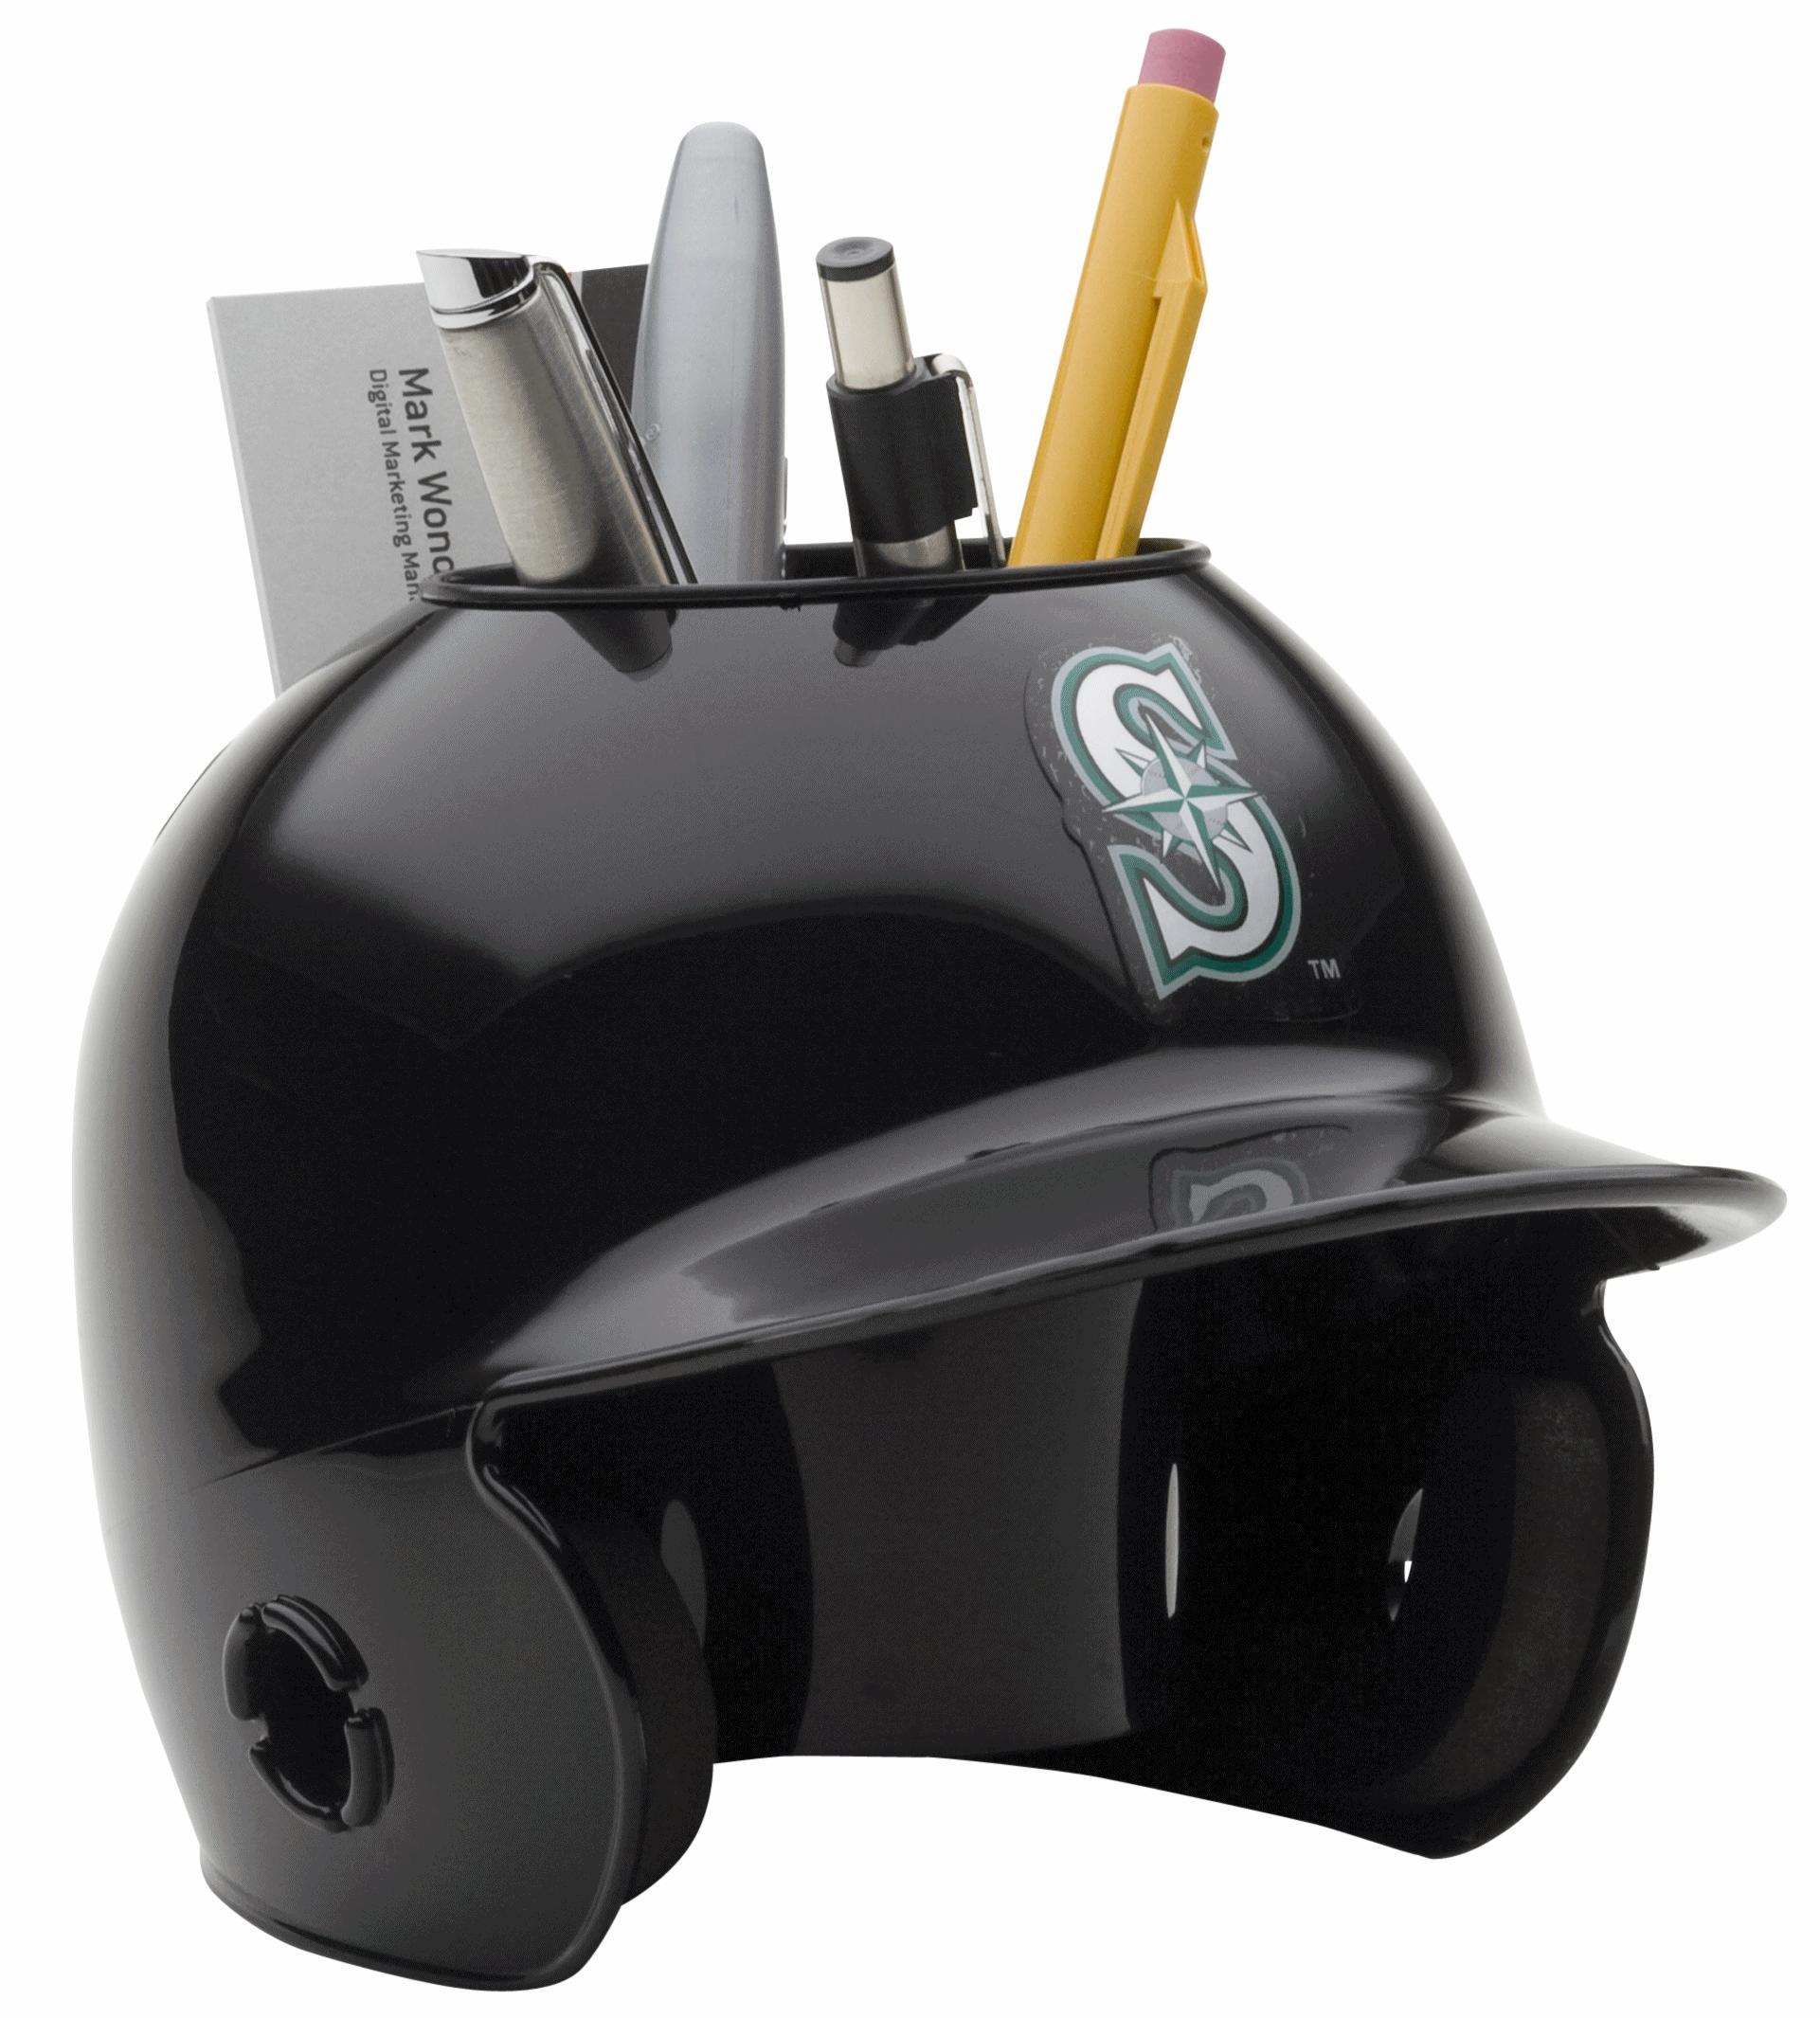 Seattle Mariners Miniature Batters Helmet Desk Caddy